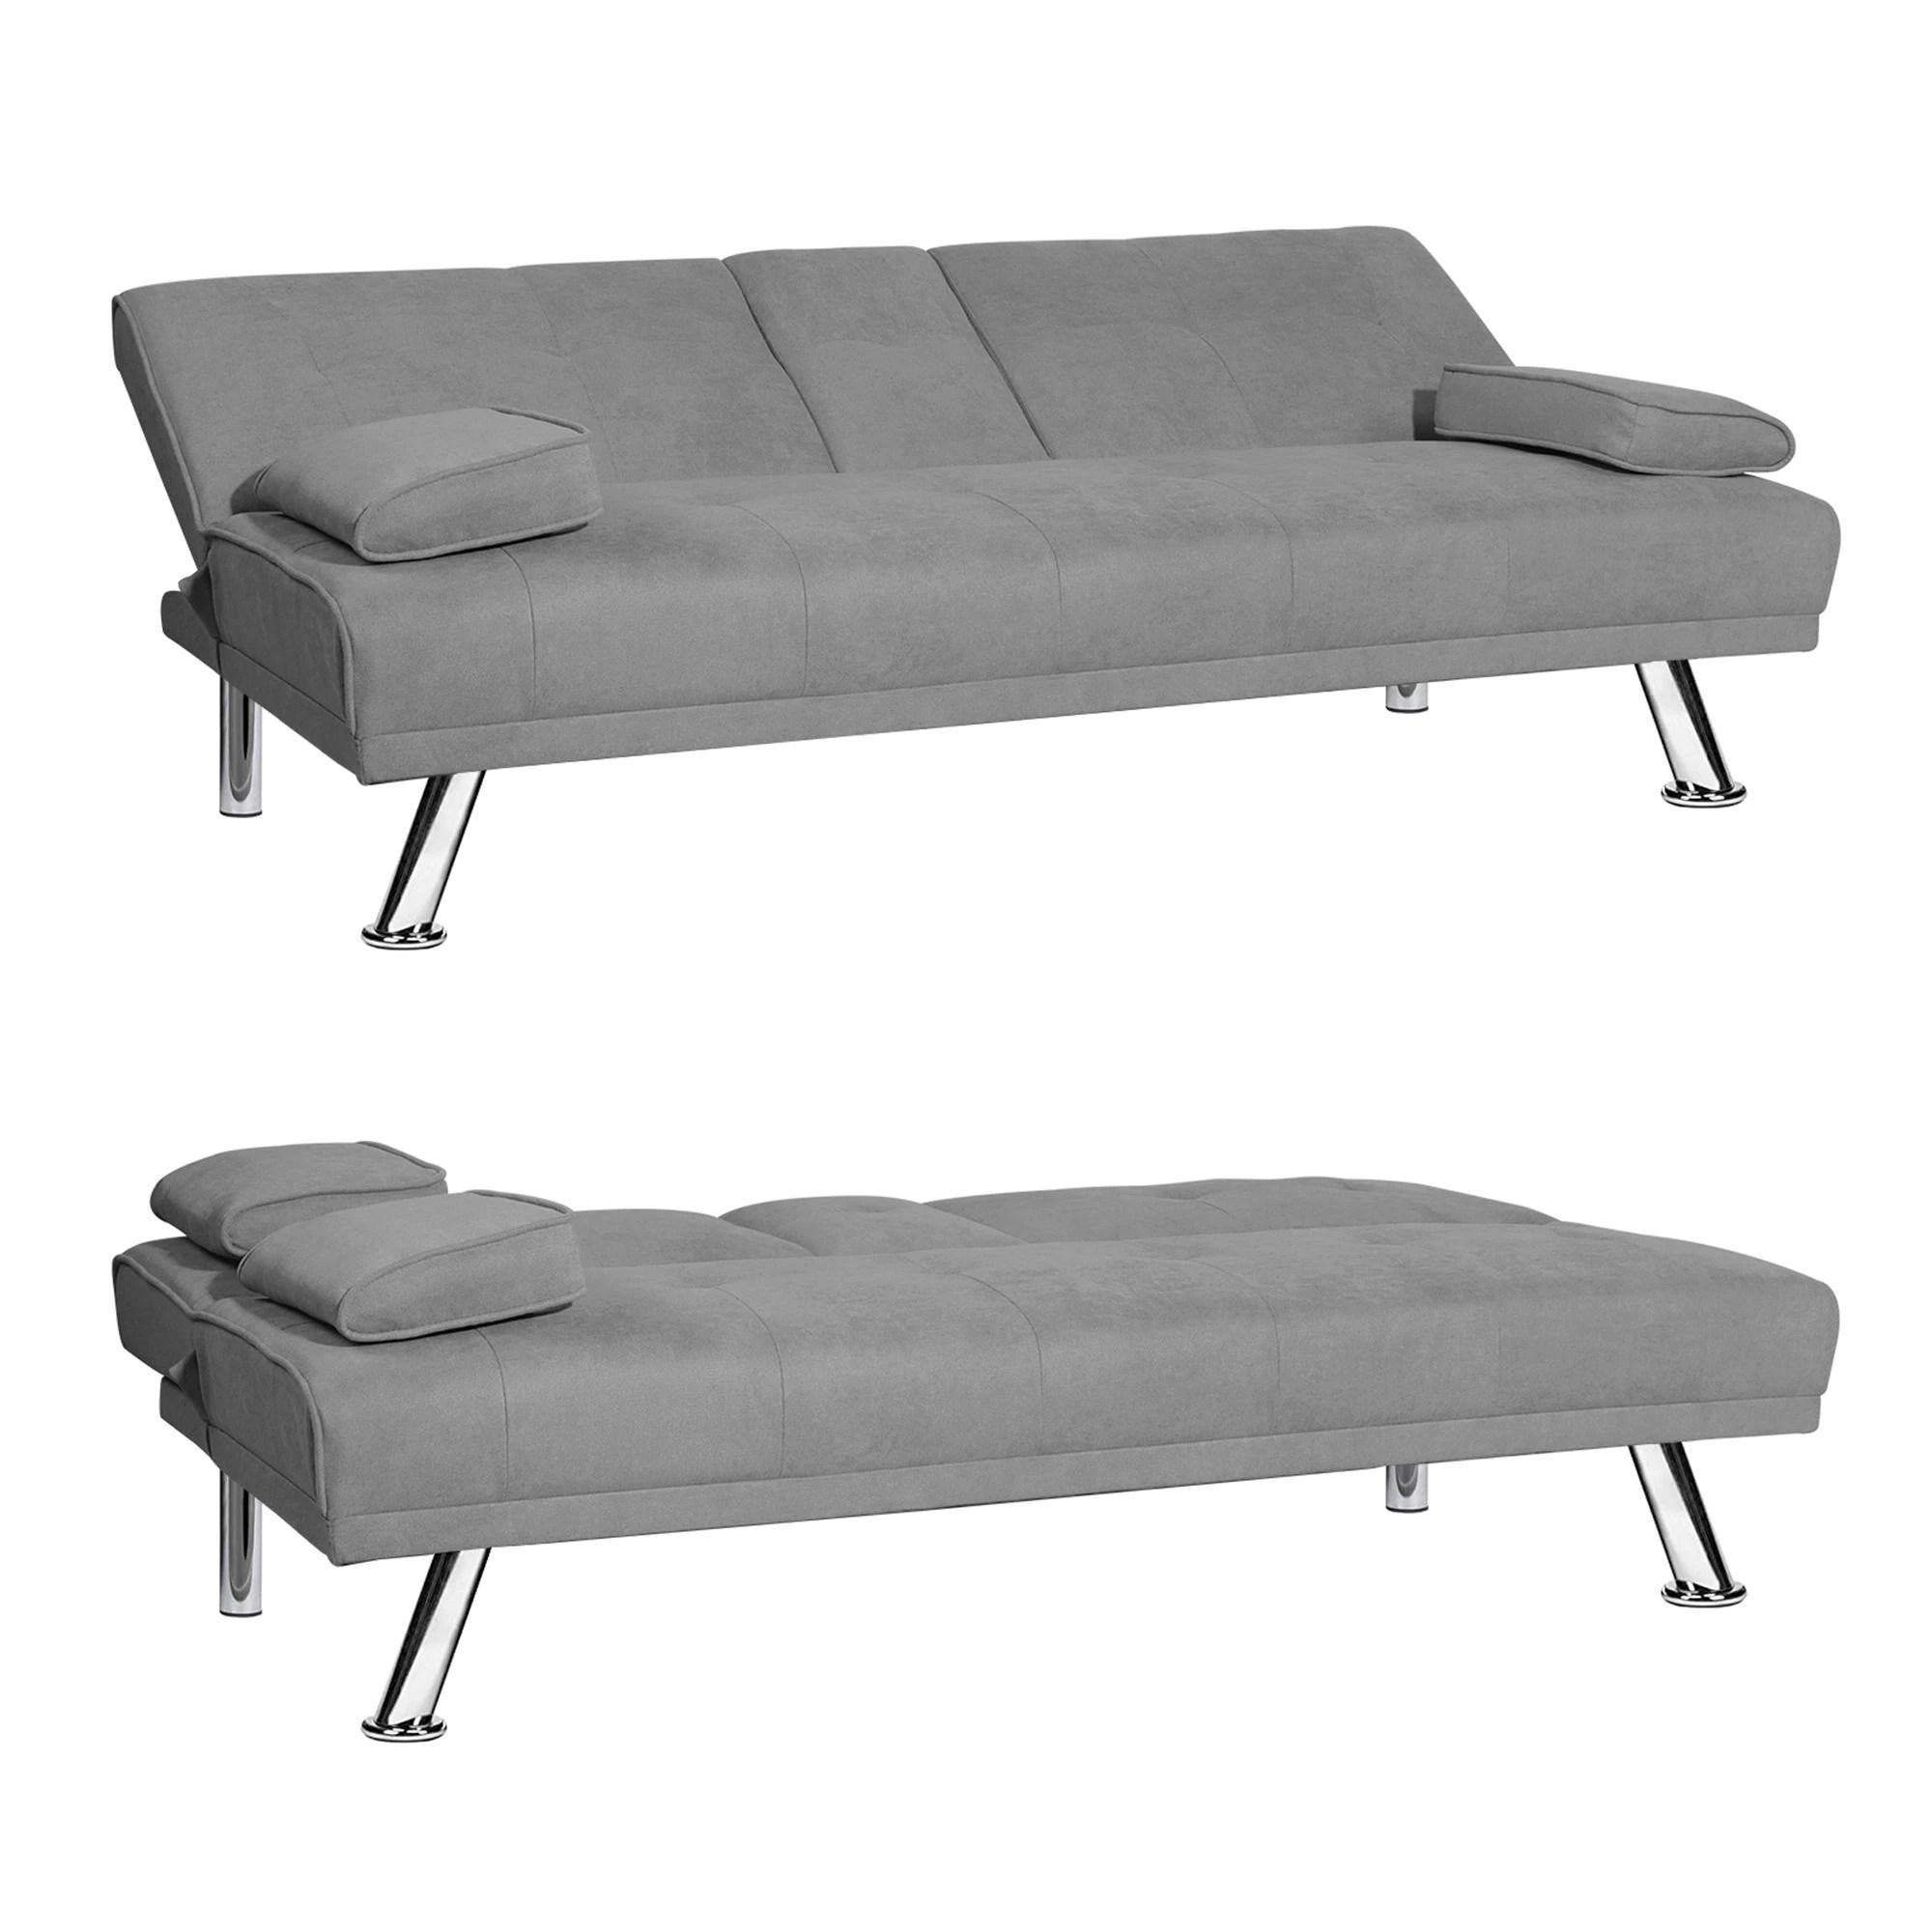 Modern Armless Fabric Sleeper Sofa Overstock 31881373